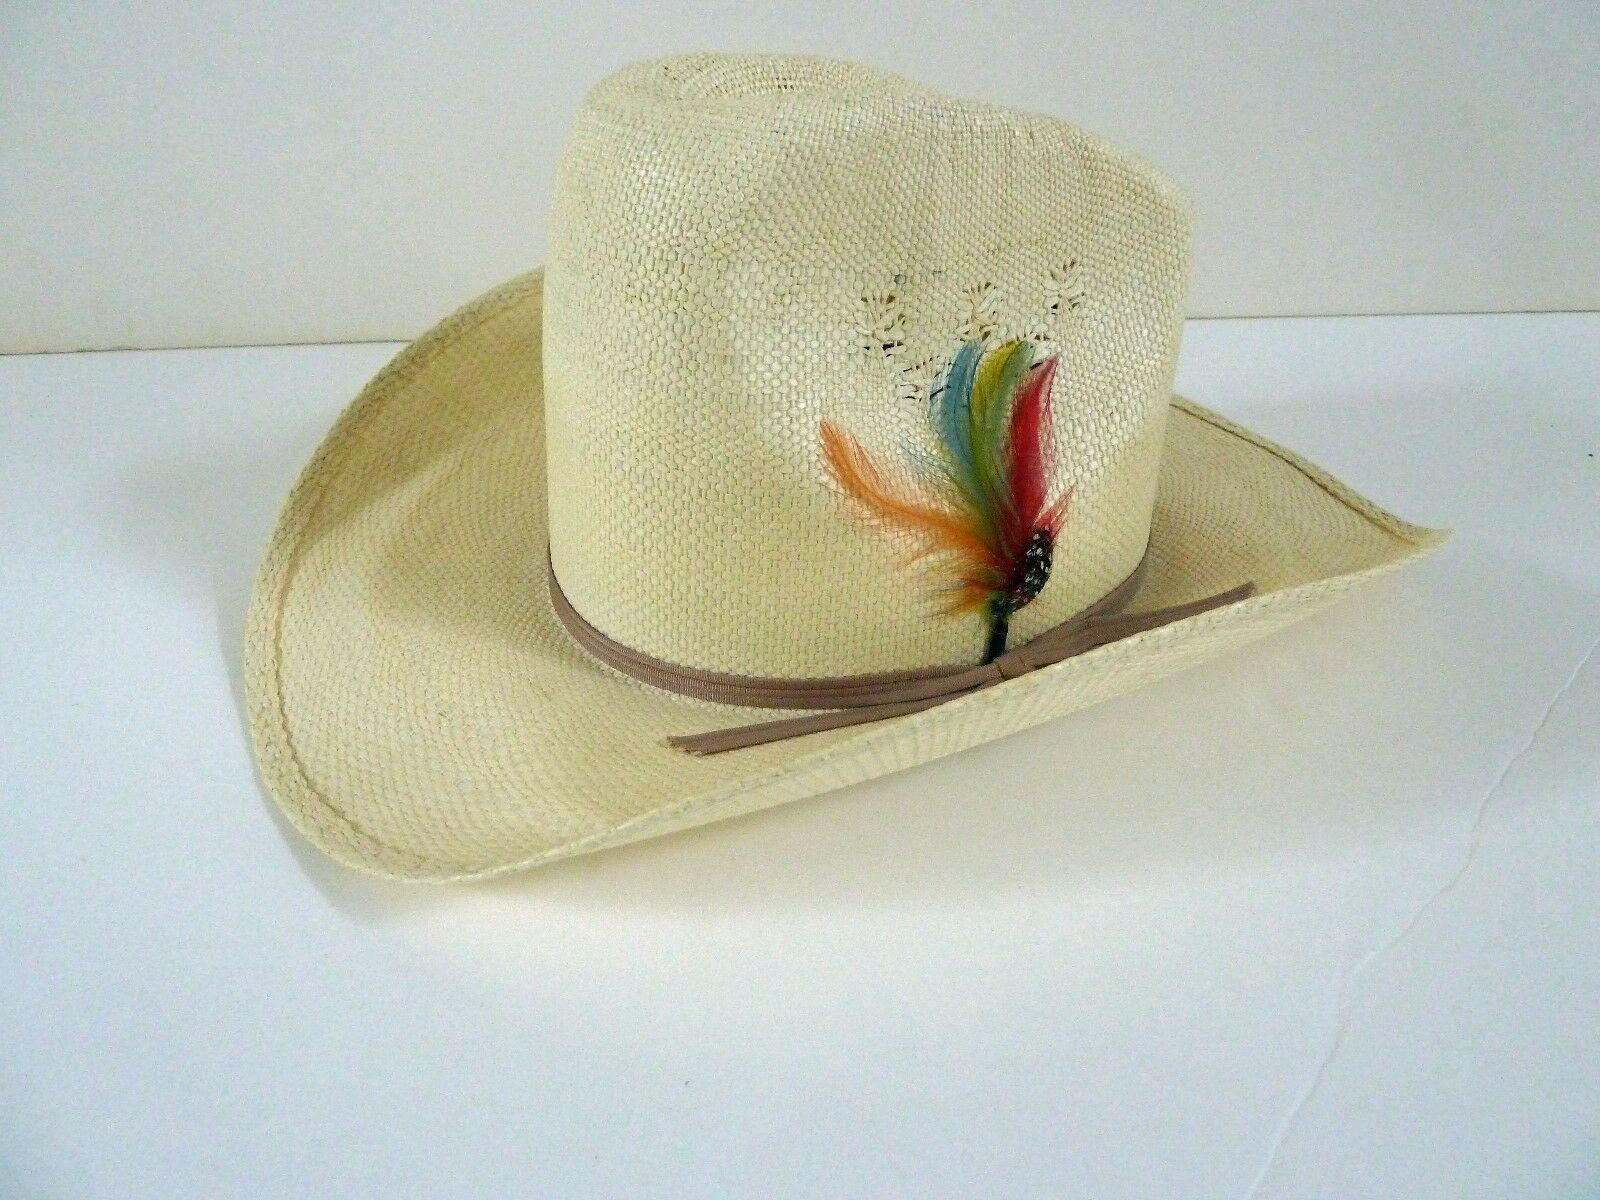 Eddy Bros Straw Hat Cowboy Western Hat Size 7 - Vintage - Excellent Condition